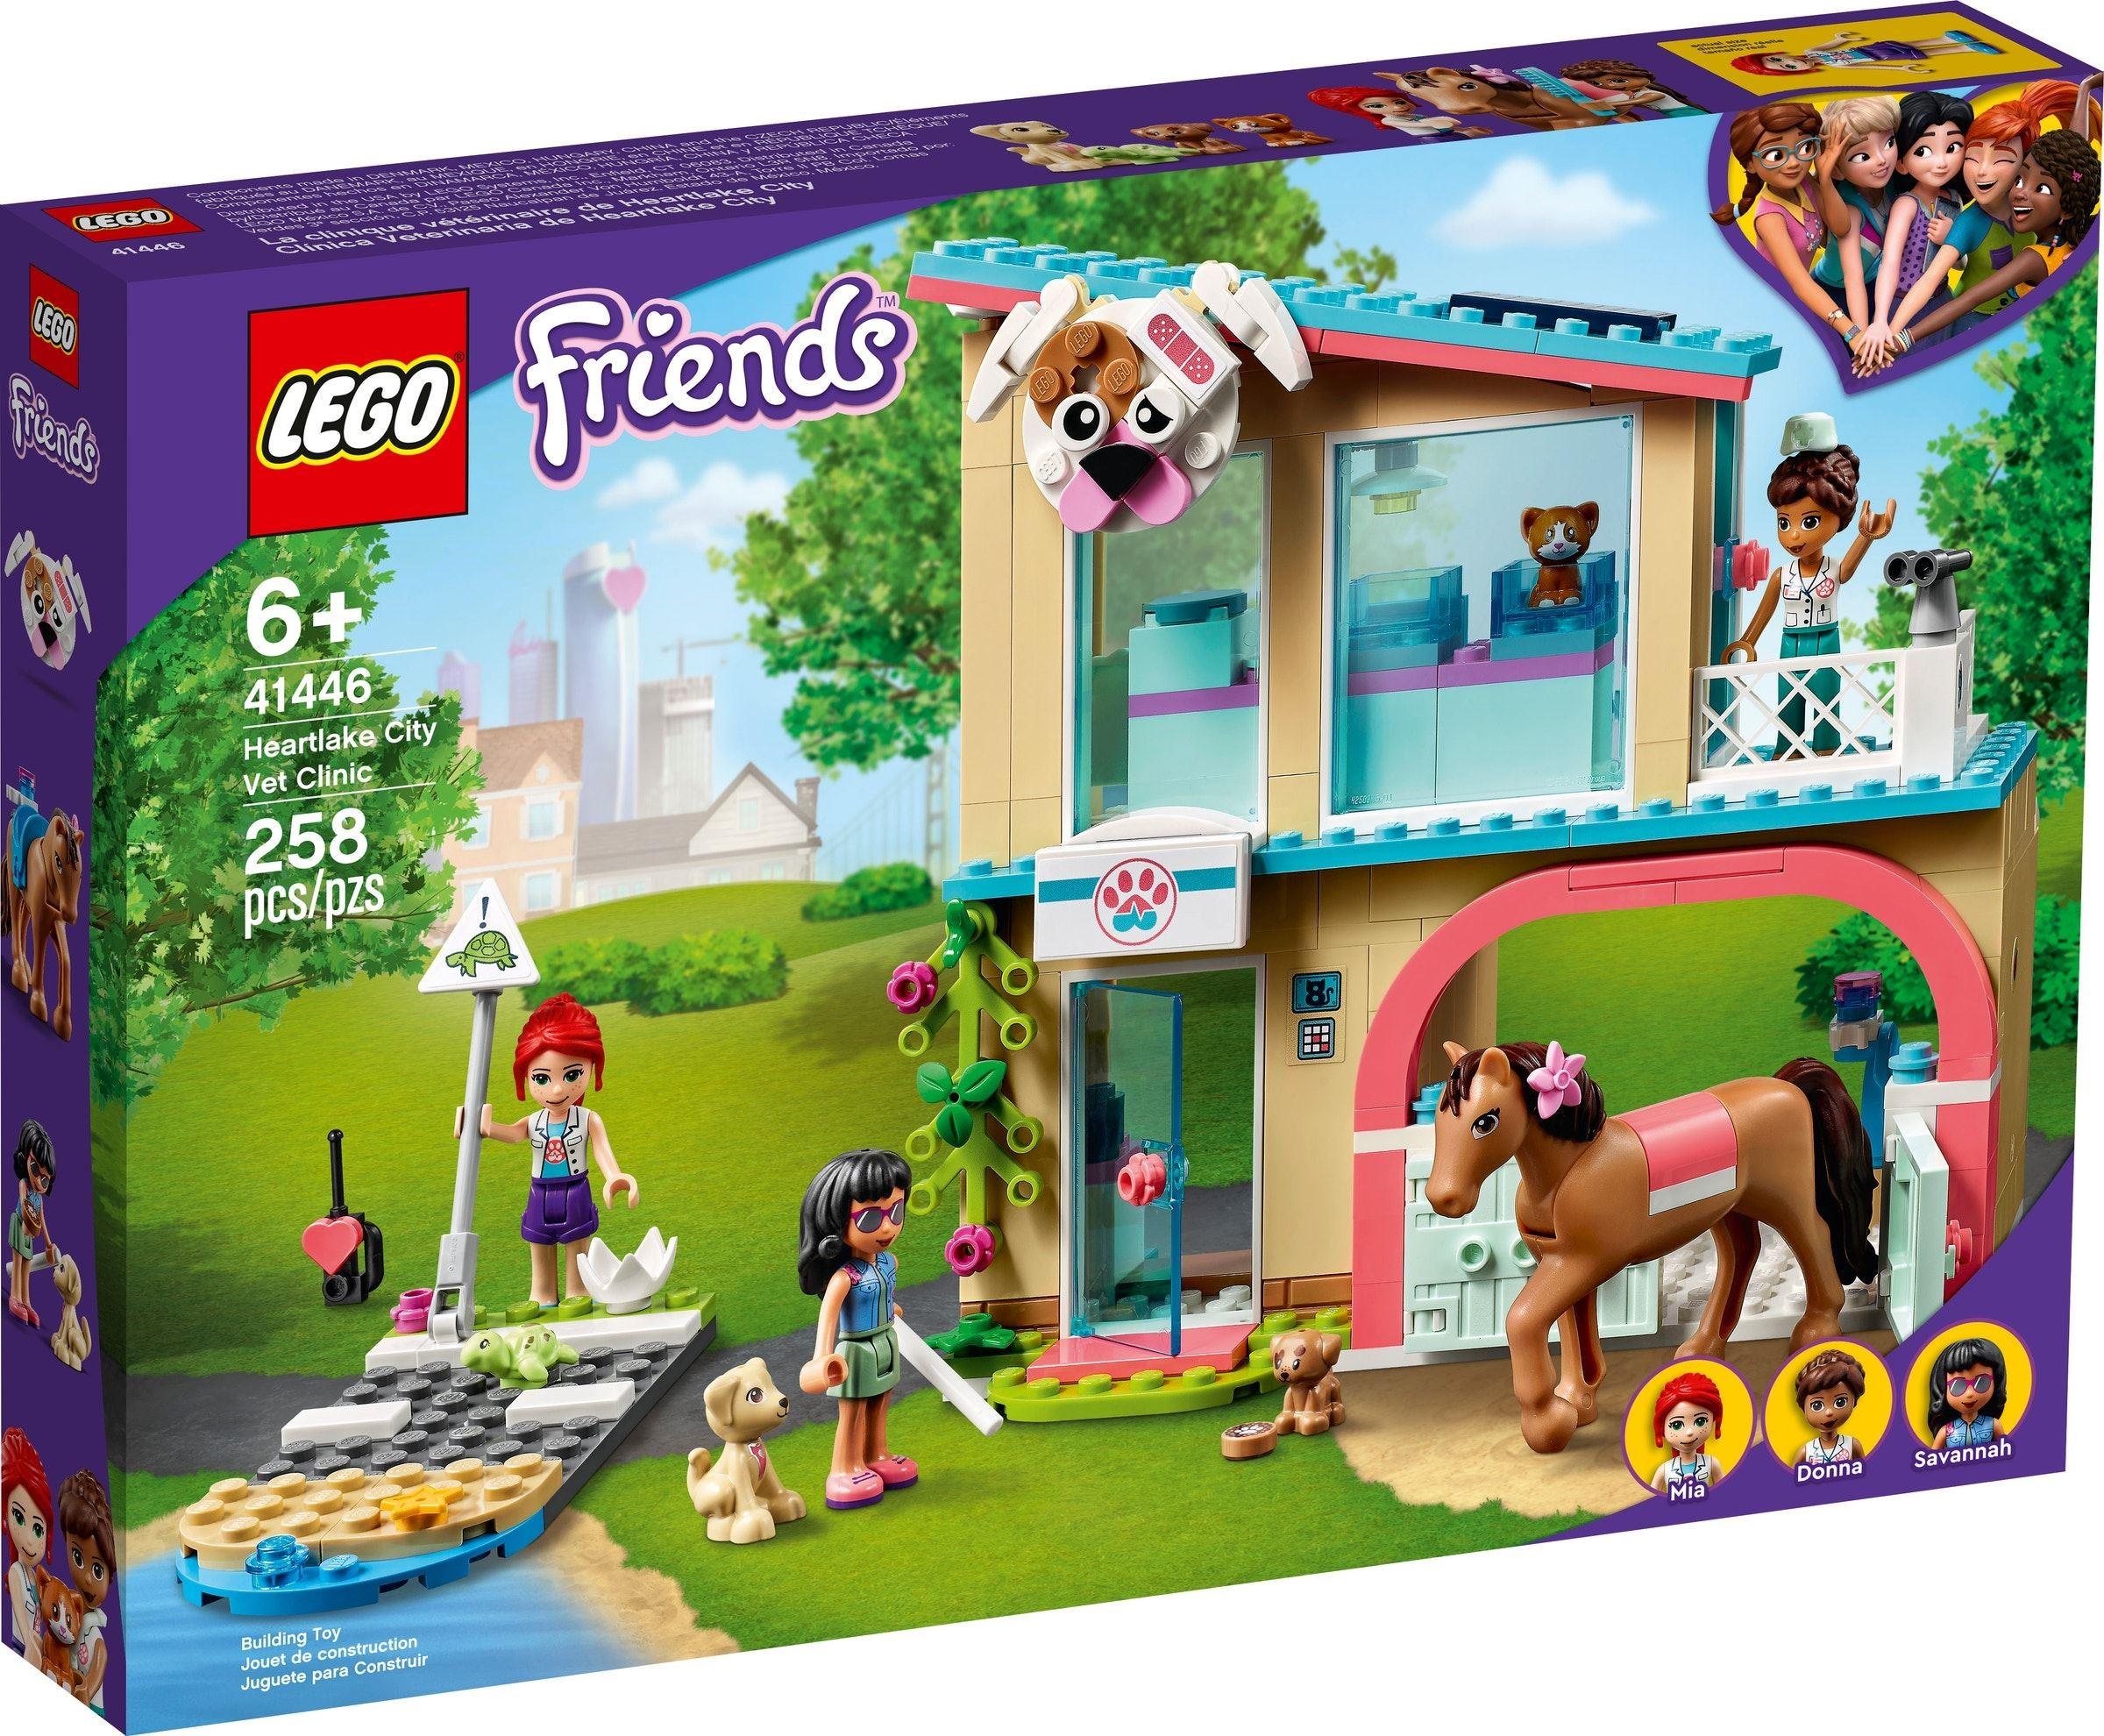 LEGO Friends - Heartlake City Vet Clinic (41446)